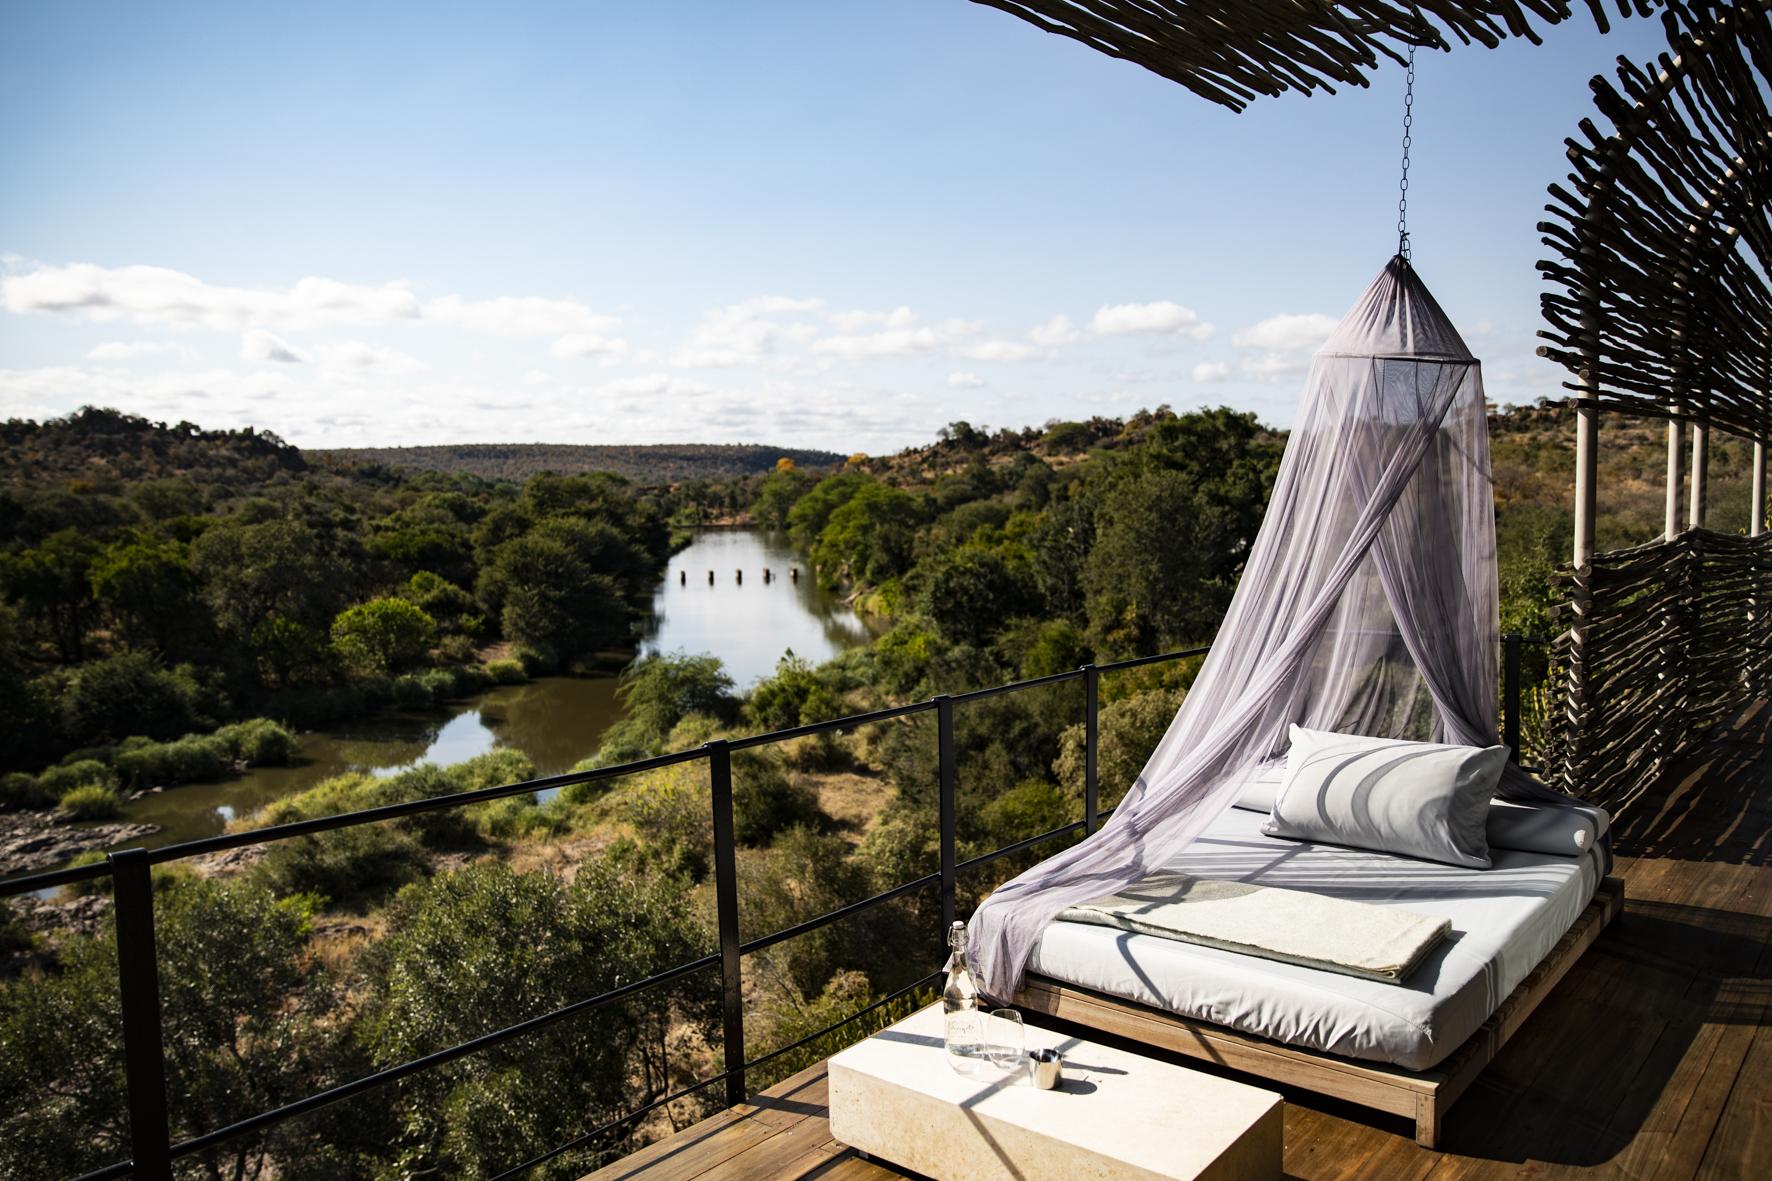 Singita-Lebombo-Lodge-Outdoor-Sleeping-with-a-View-1.jpg